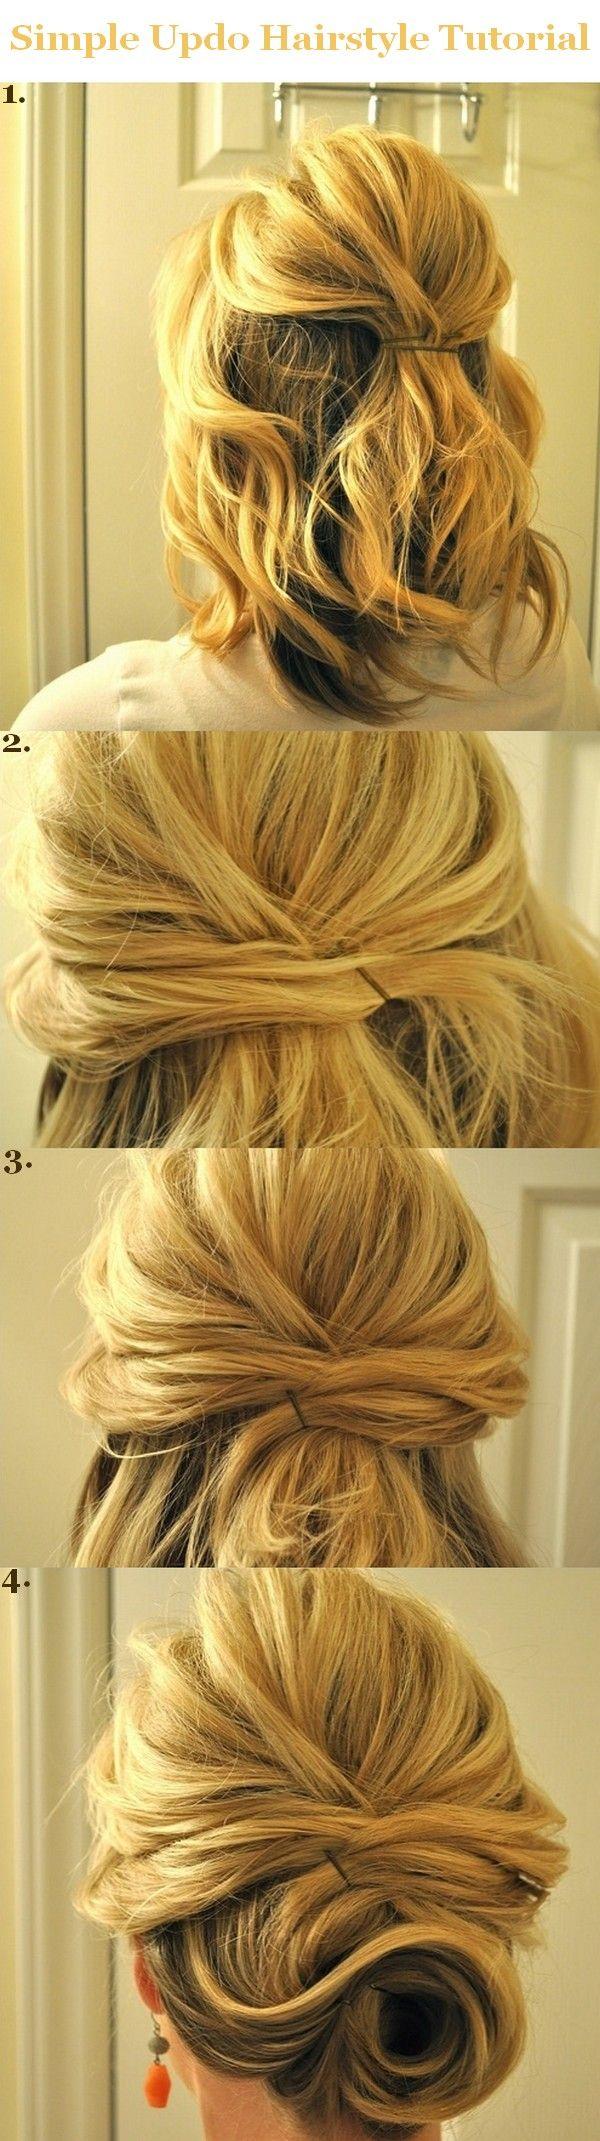 simple updo hairstyle tutorial @Laurel Wypkema - mom of the groom hairstyle